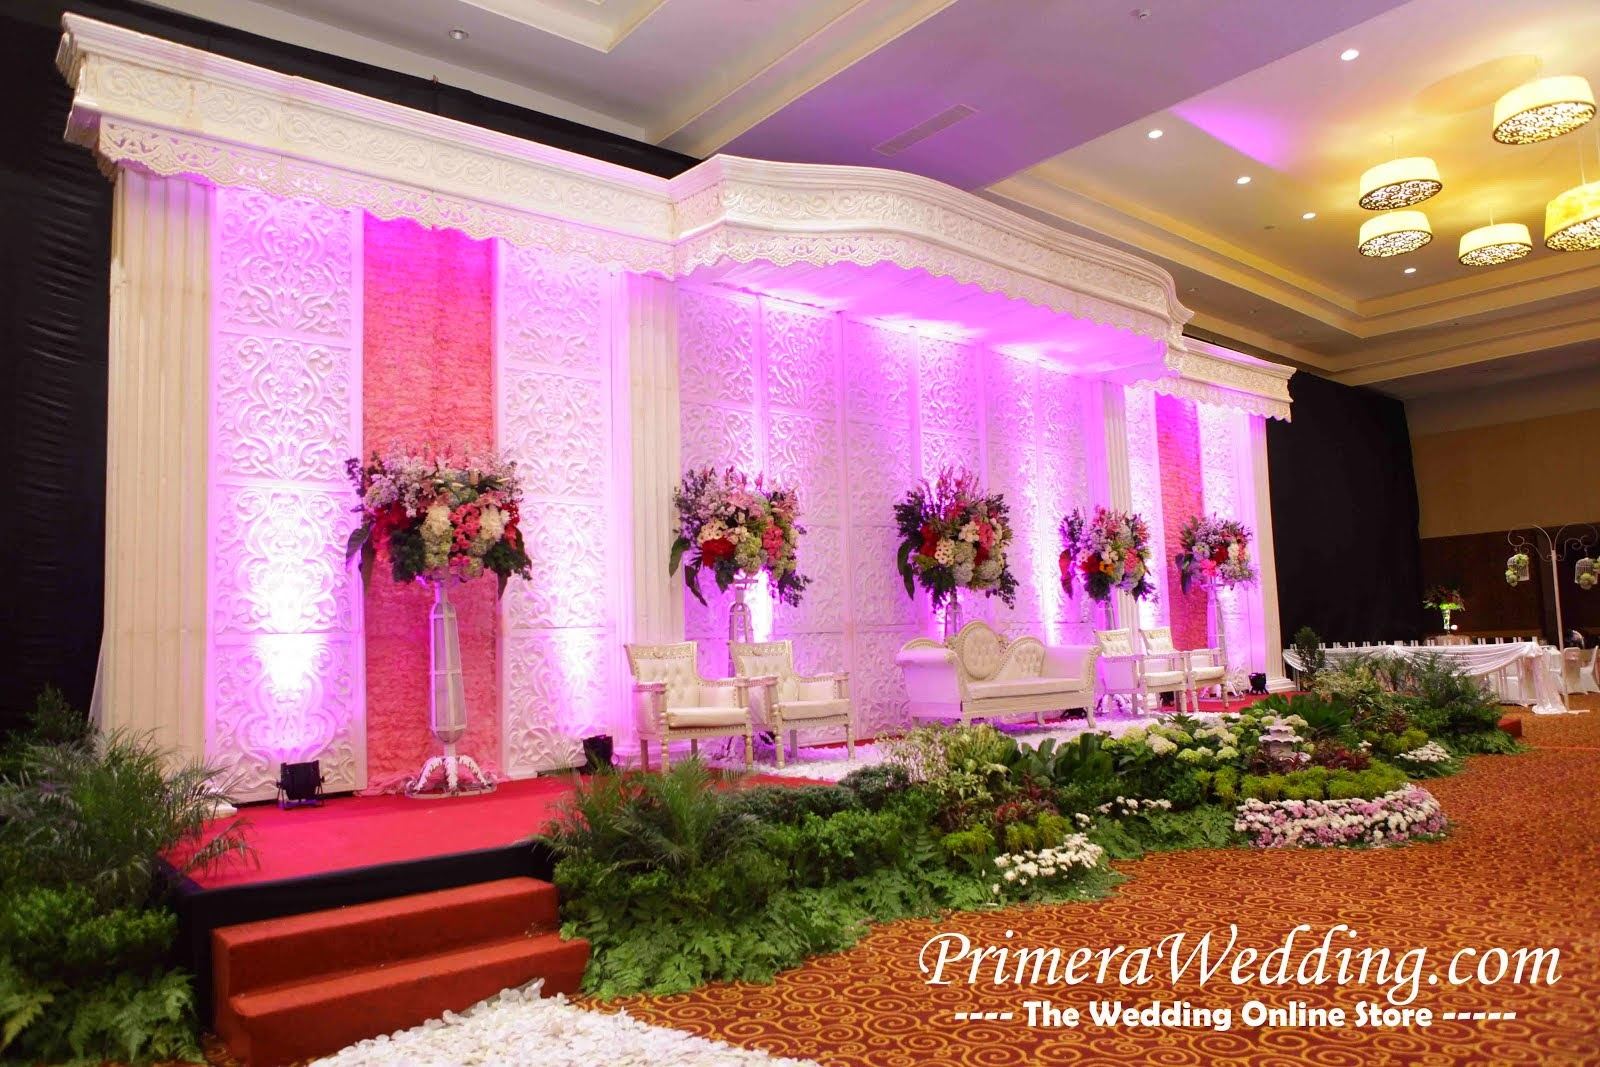 Primera Wedding